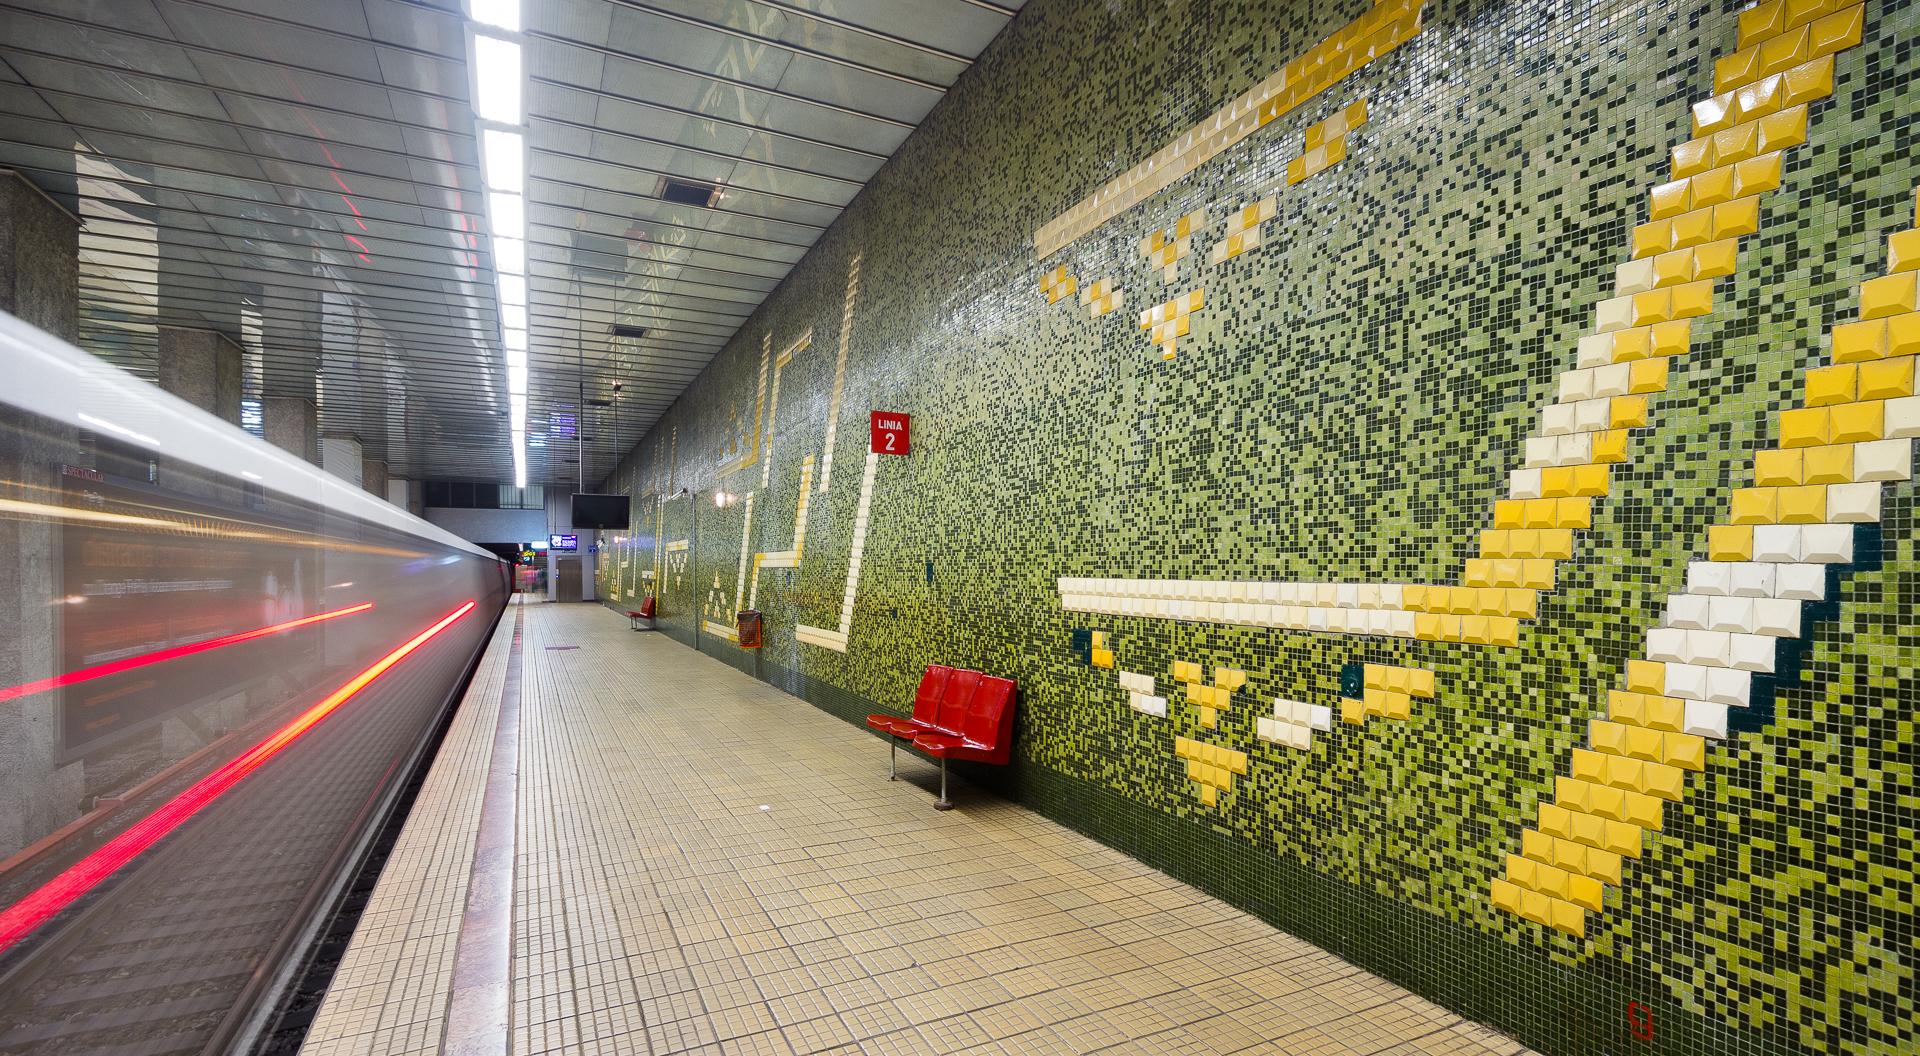 Program xerox metrou grozavesti - program xerox metrou grozavesti windows